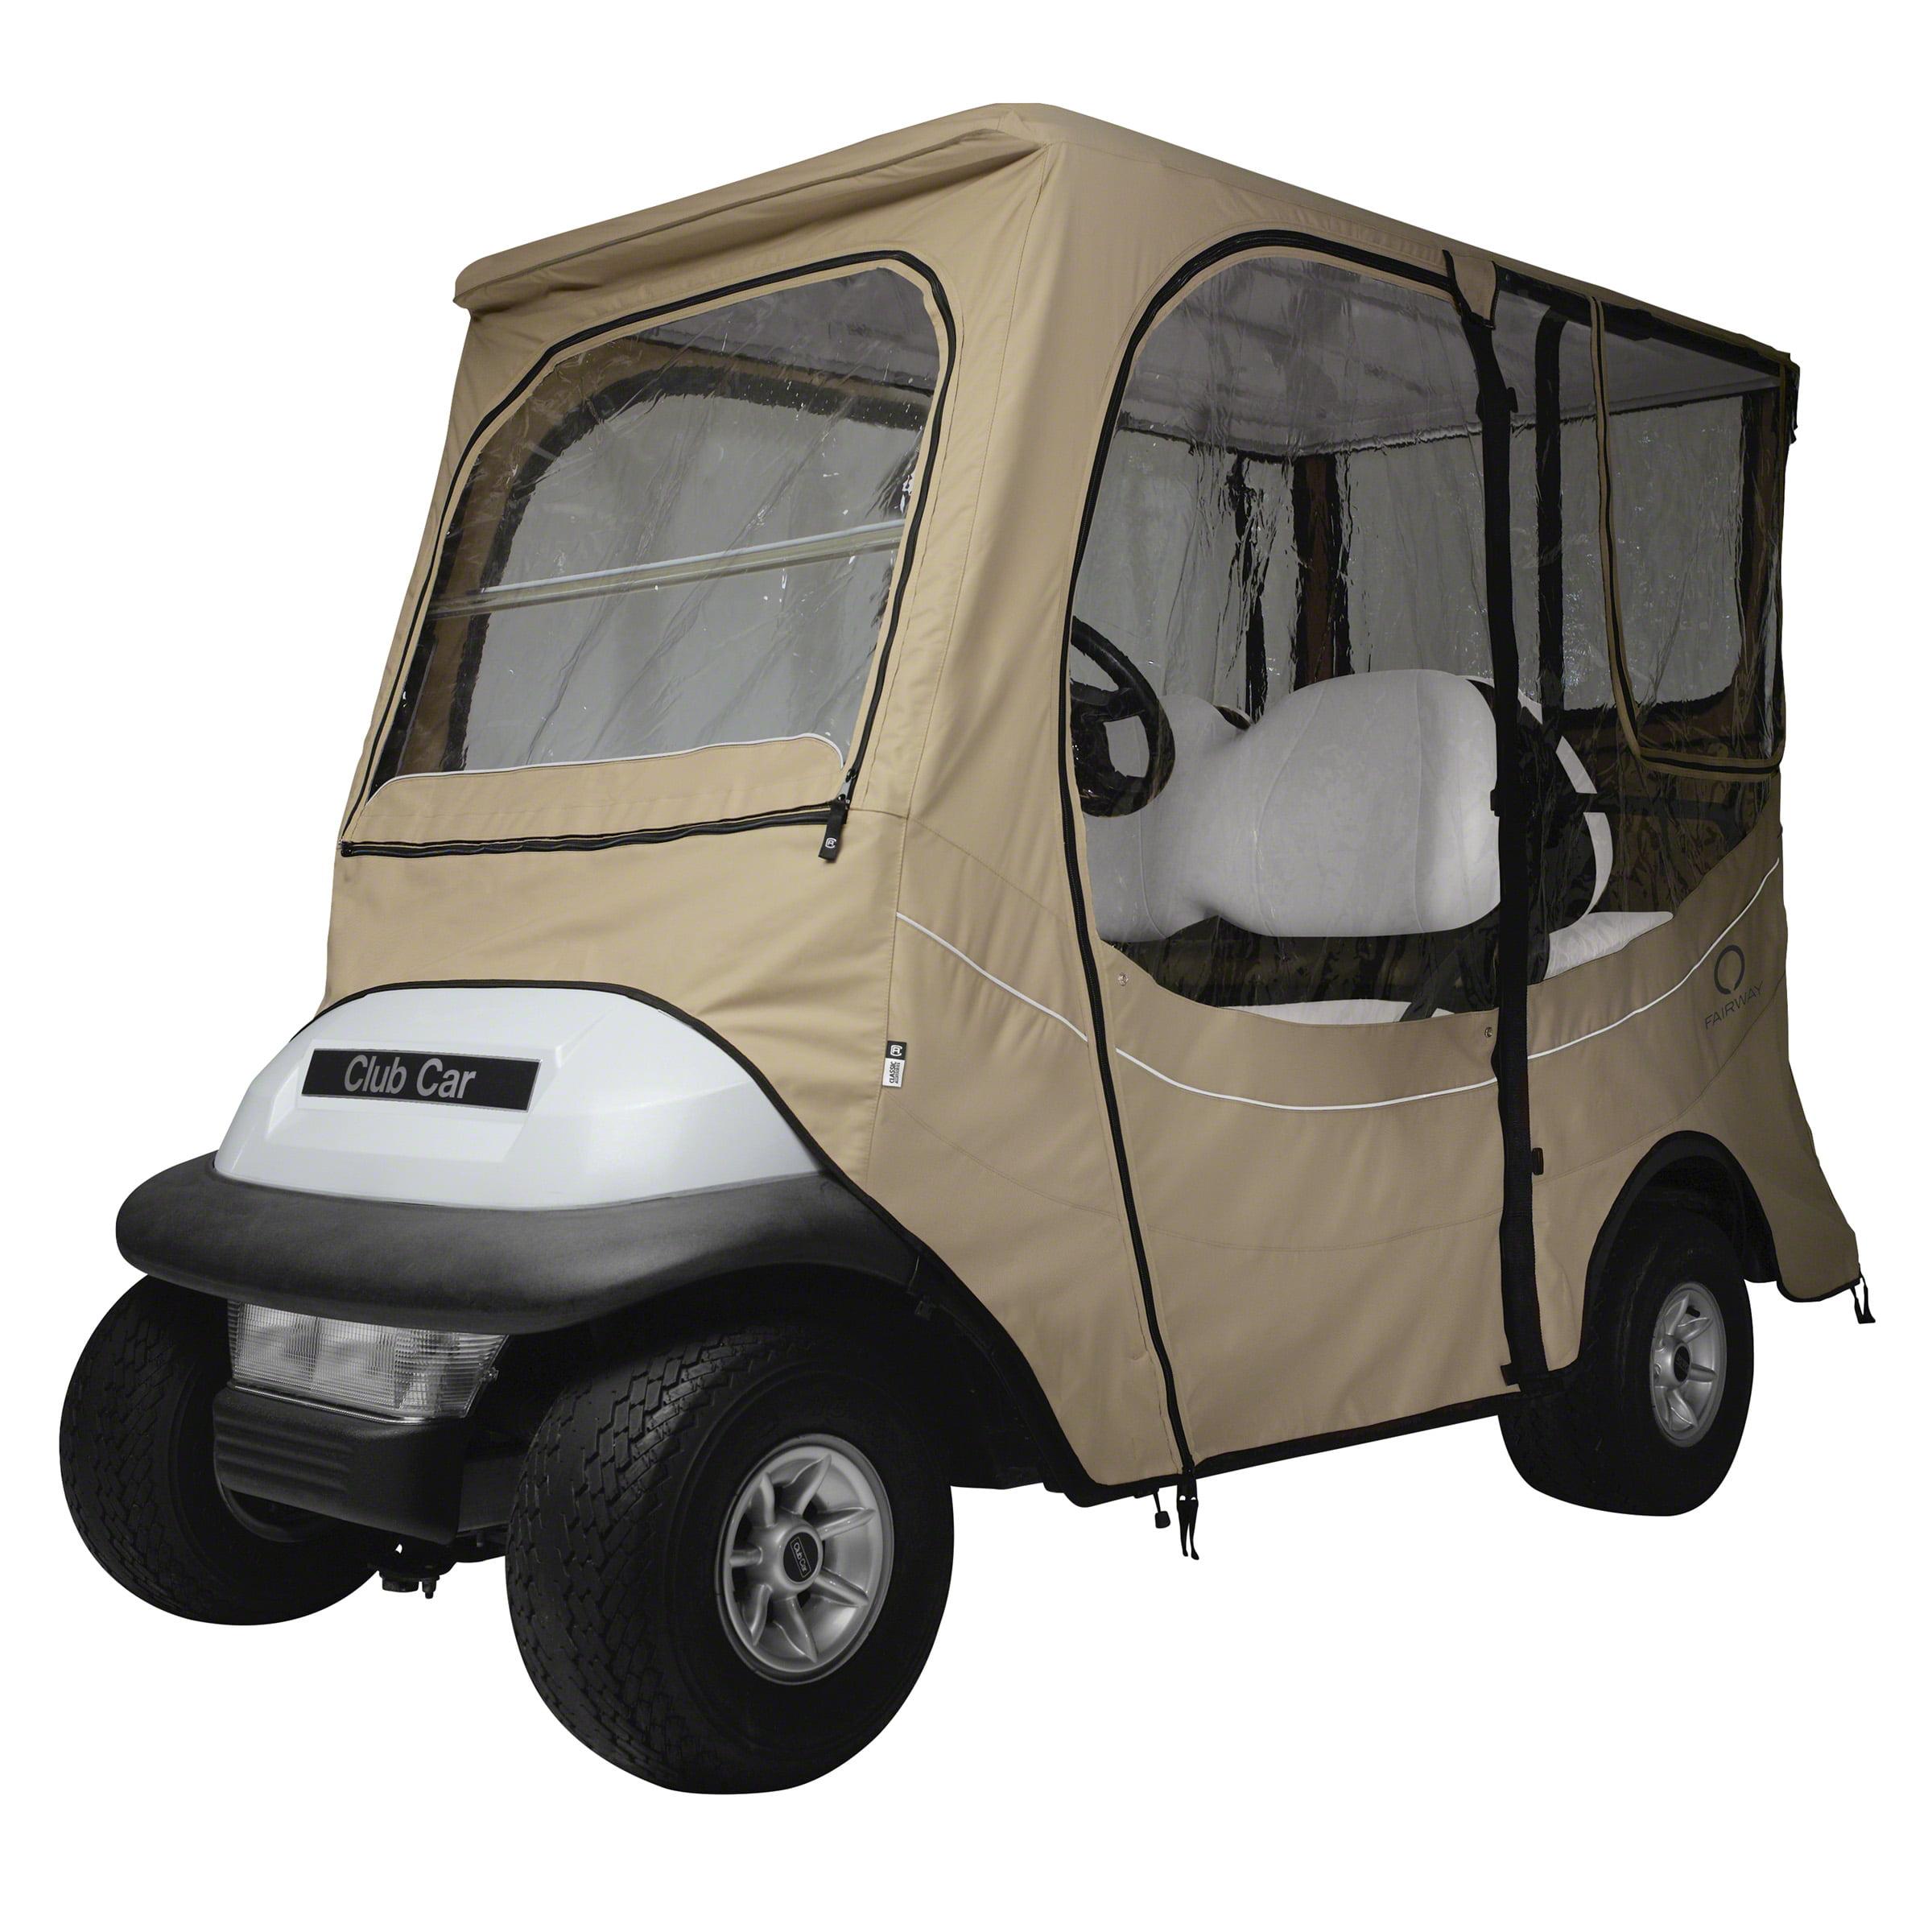 Club Car Accessories >> Classic Accessories Fairway Long Roof Club Car Precedent Fadesafe Golf Cart Enclosure Khaki